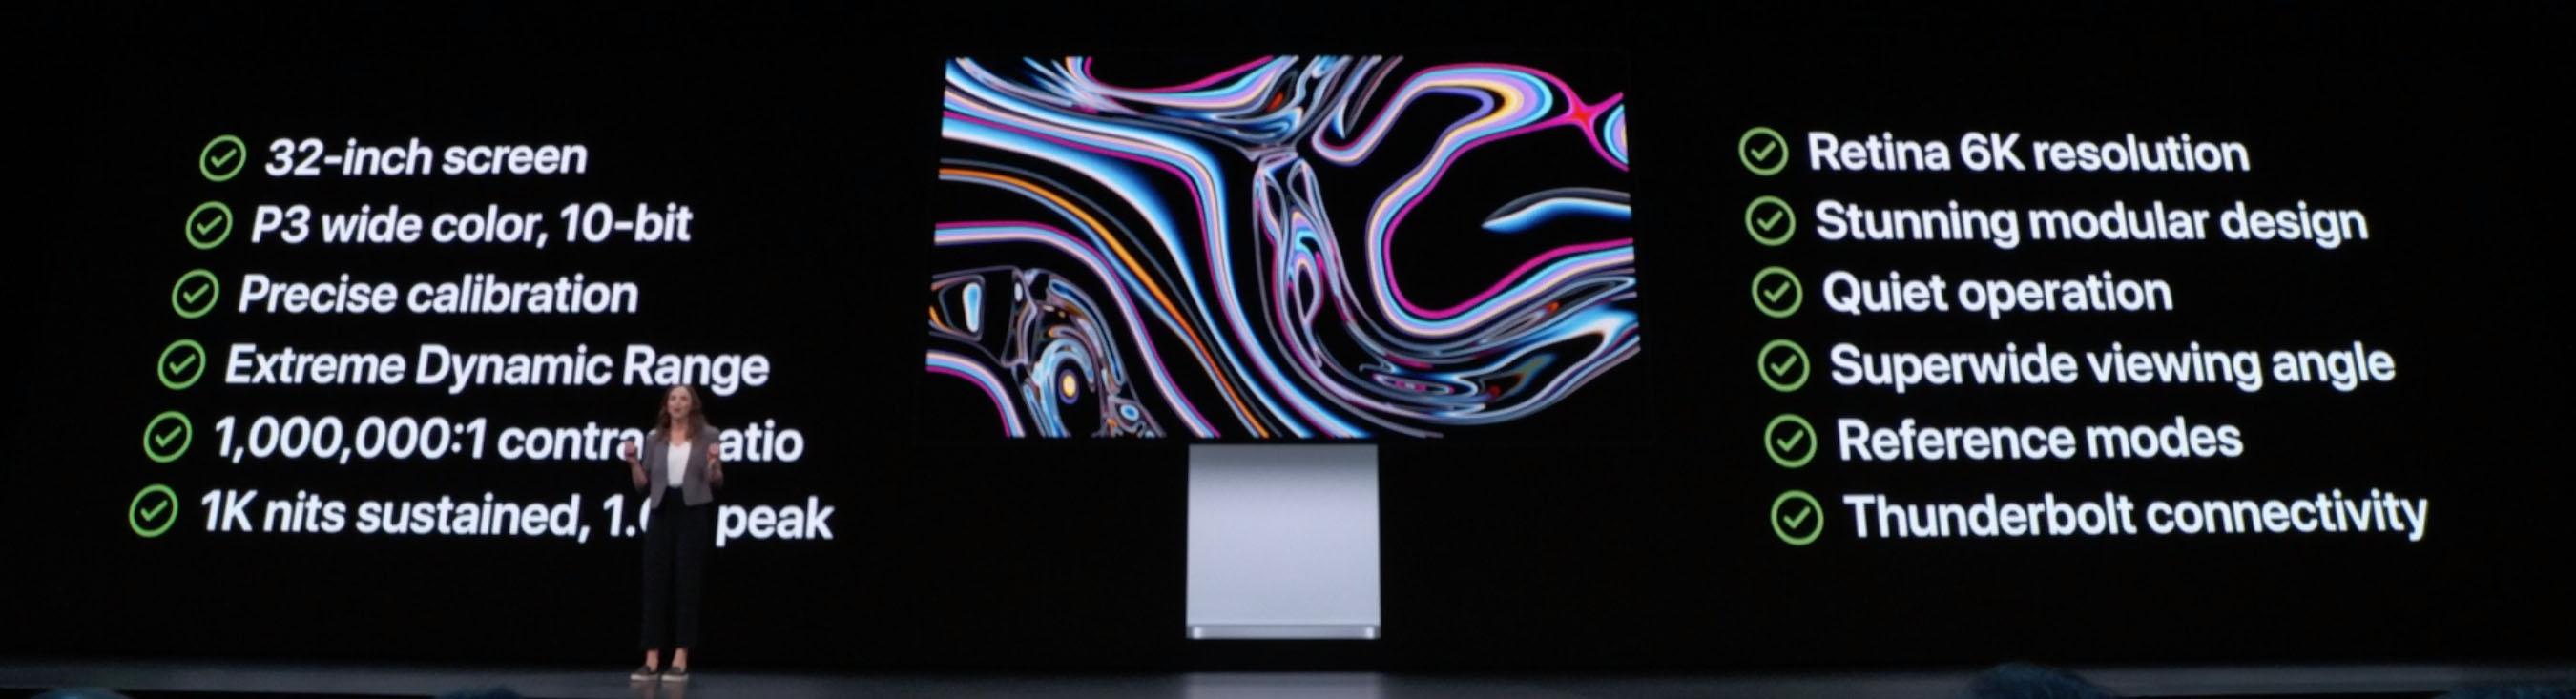 xdr display pro